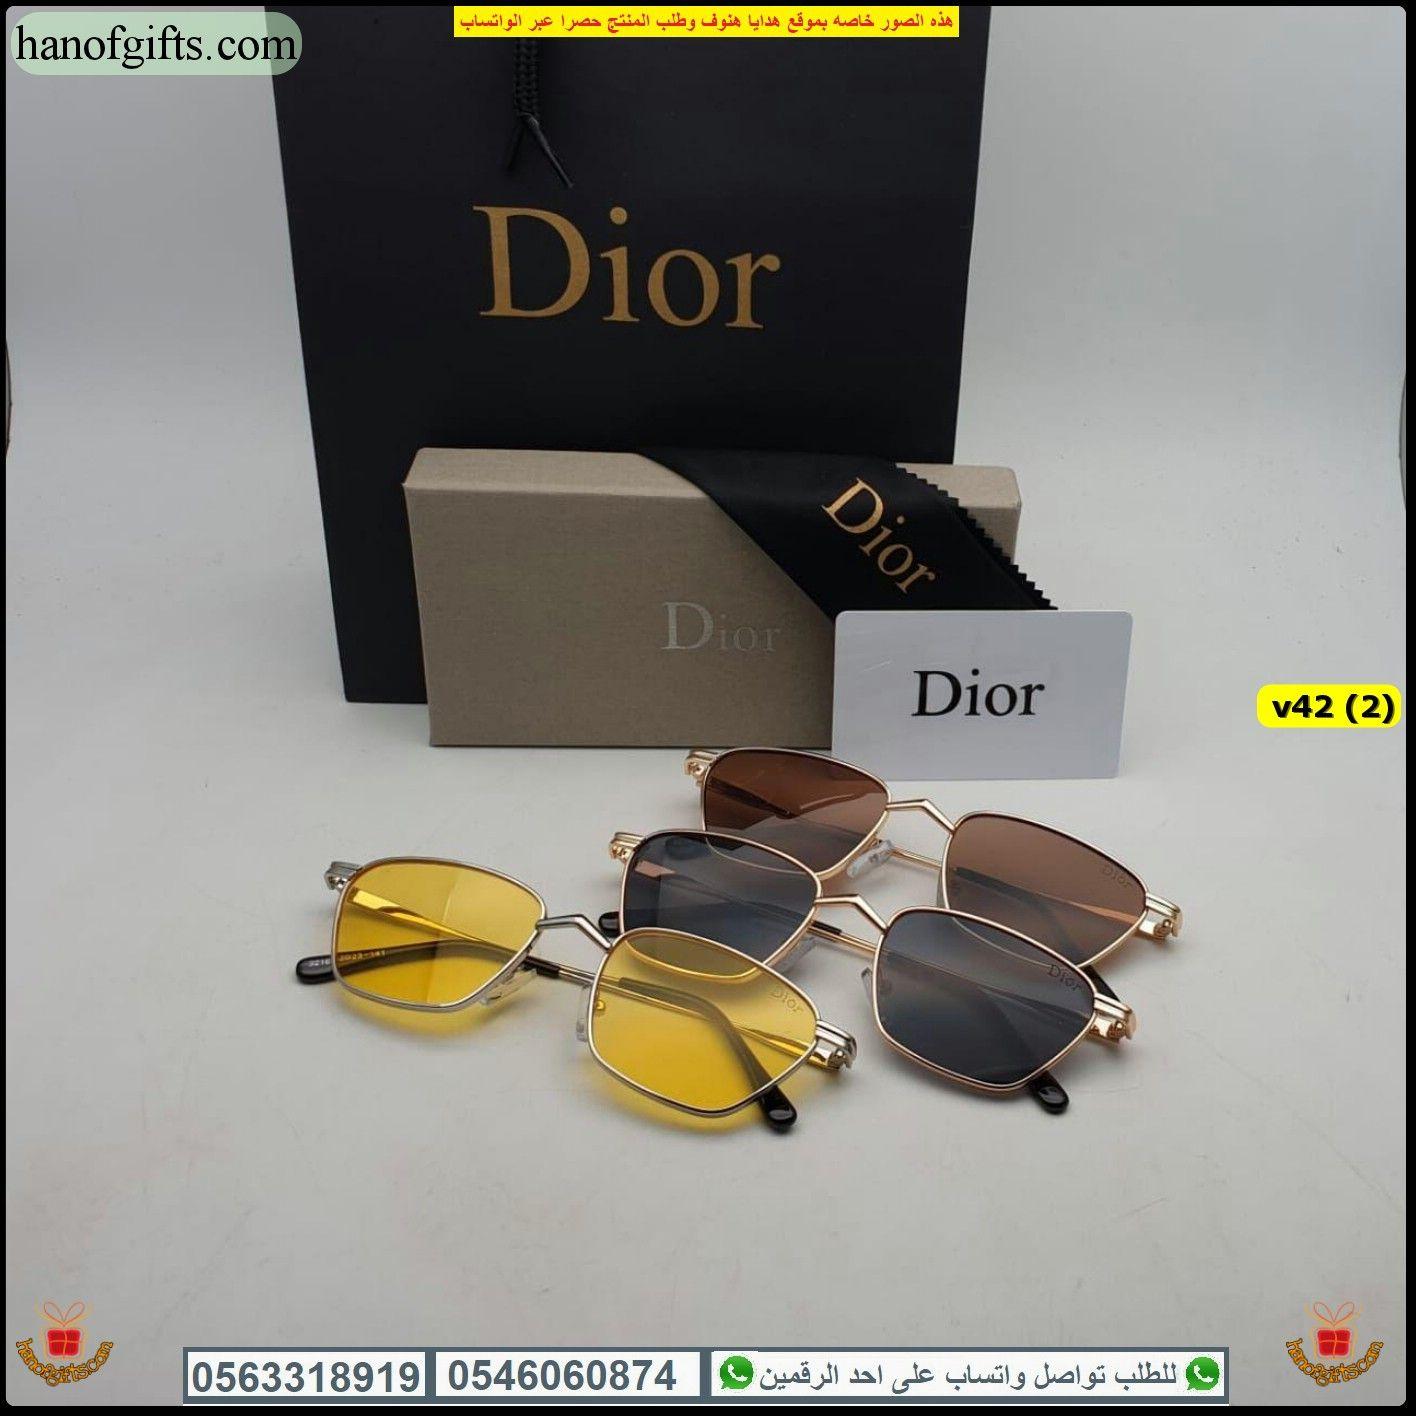 نظارات شمسية ديور رجالي مع كامل ملحقاتها من كيس و علبة ومنديل و كرت هدايا هنوف Oval Sunglass Dior Sunglasses